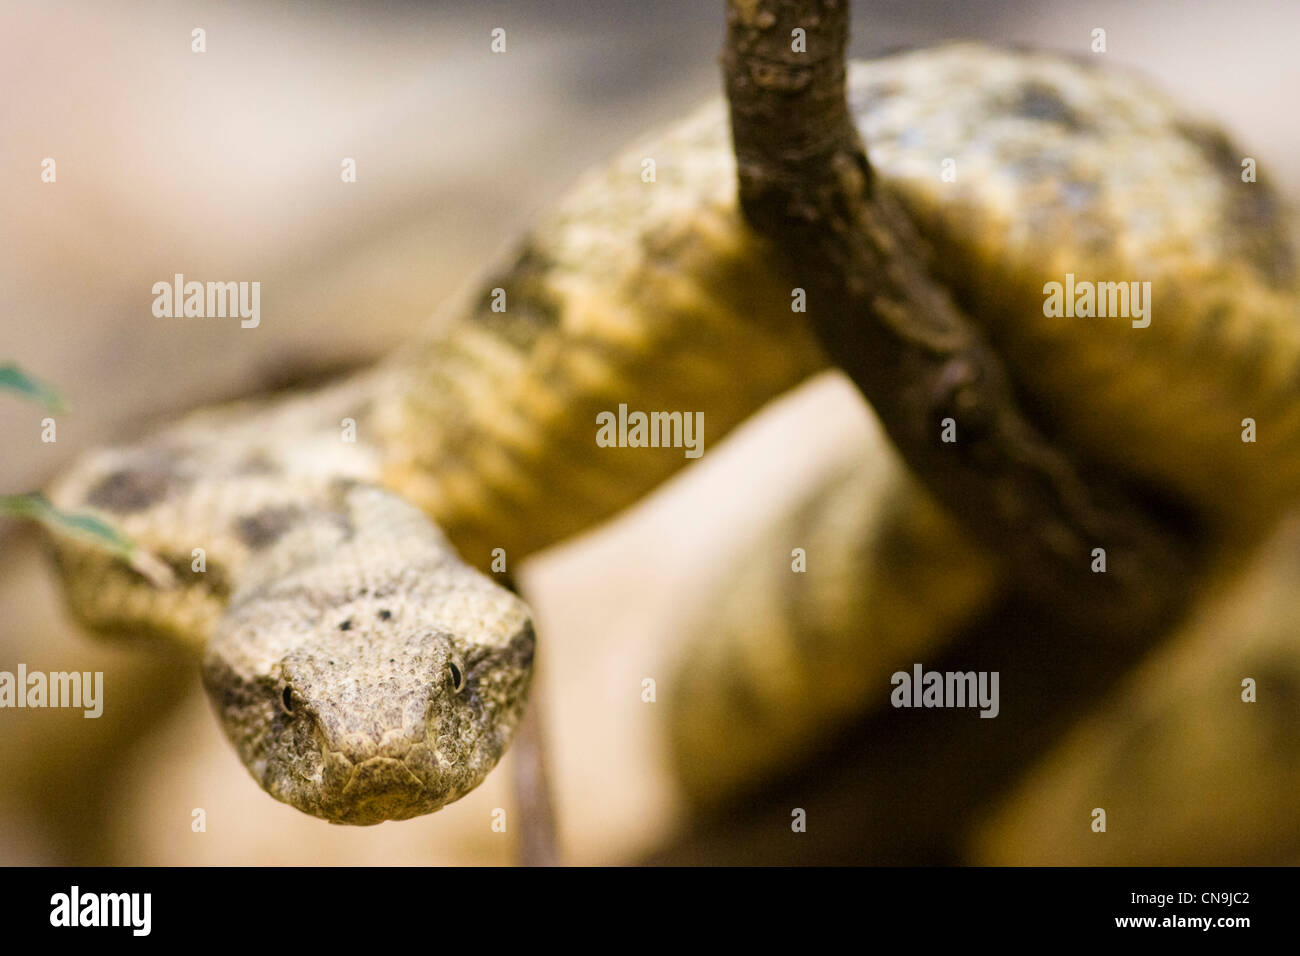 Levantine Viper - Macrovipera lebetina - serpente velenoso Immagini Stock